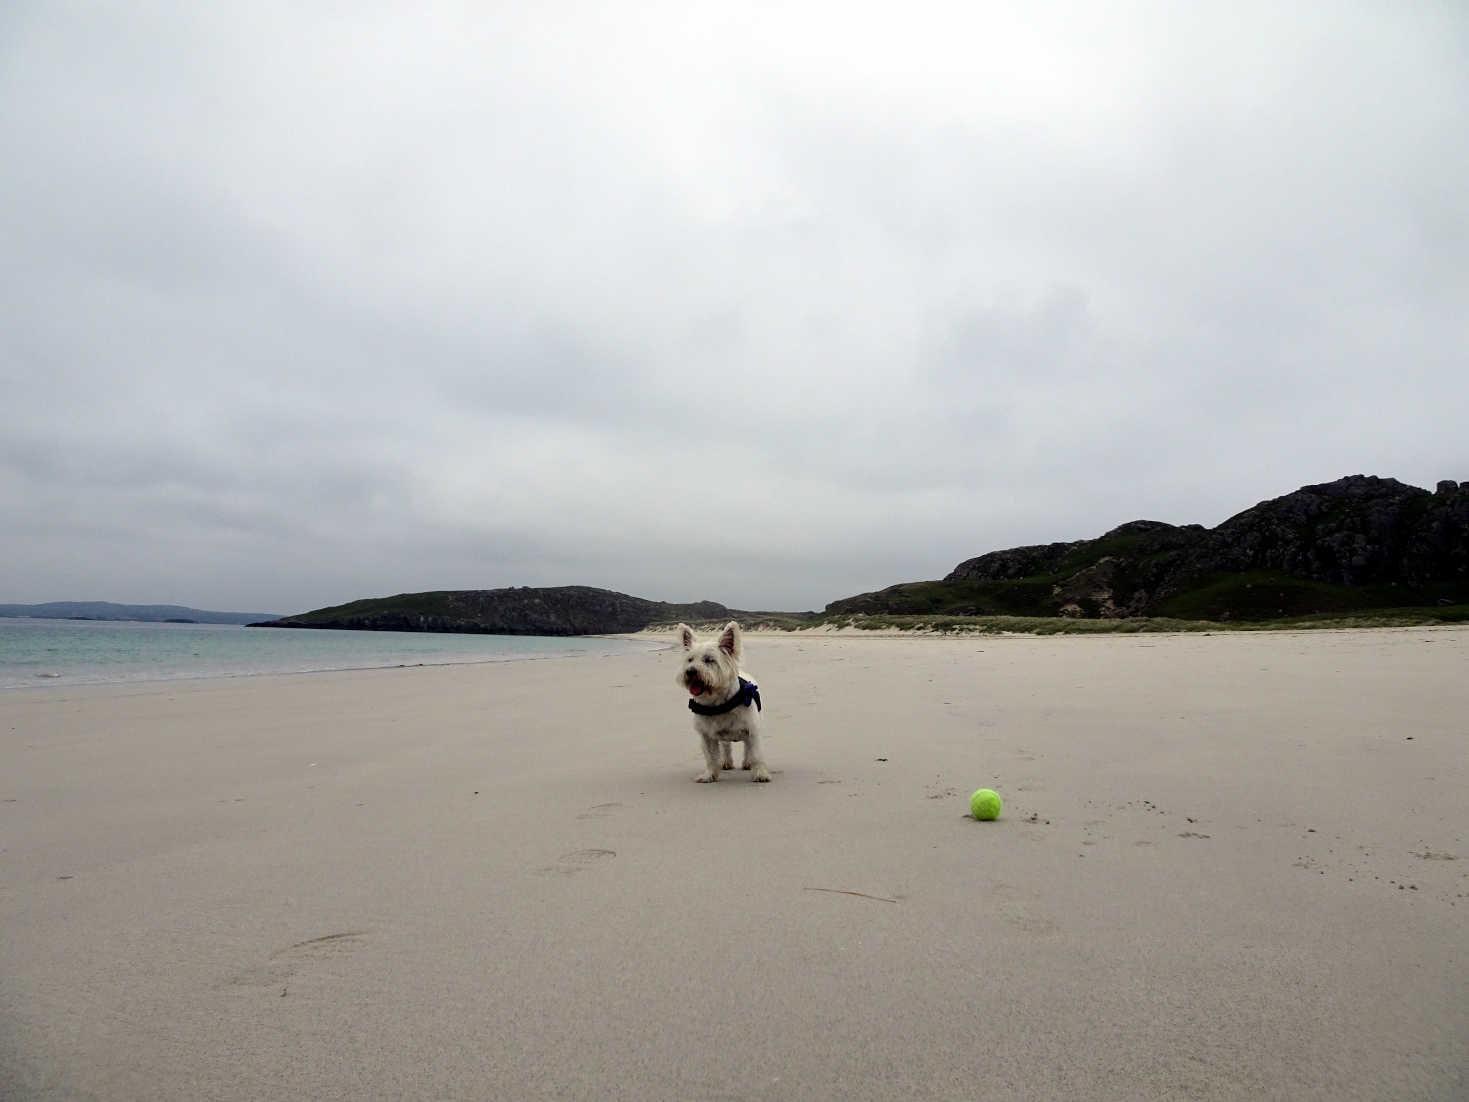 poppysocks playing ball on reef beach